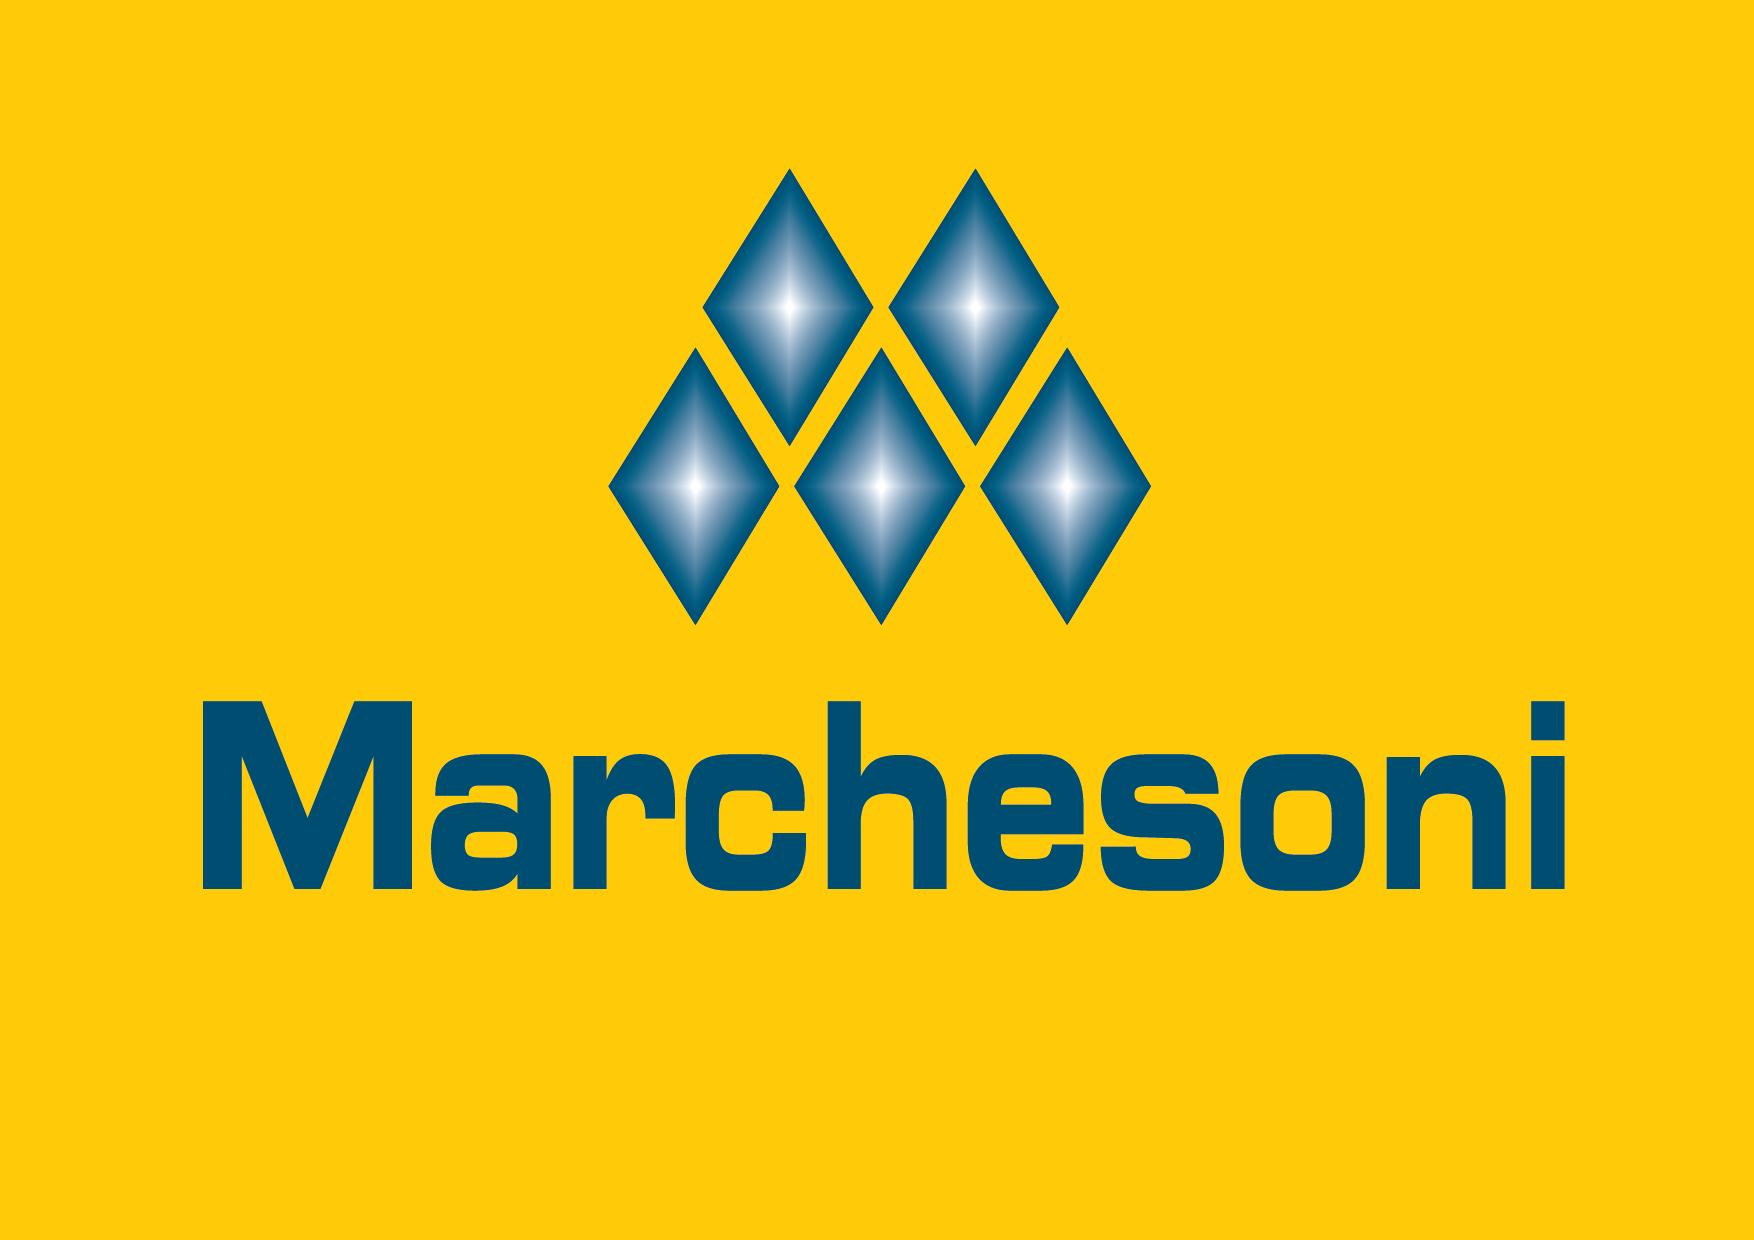 Estufa Fria c/ 4 Gelo-X Marchesoni 42 CM - EF.7.020  - Carmel Equipamentos